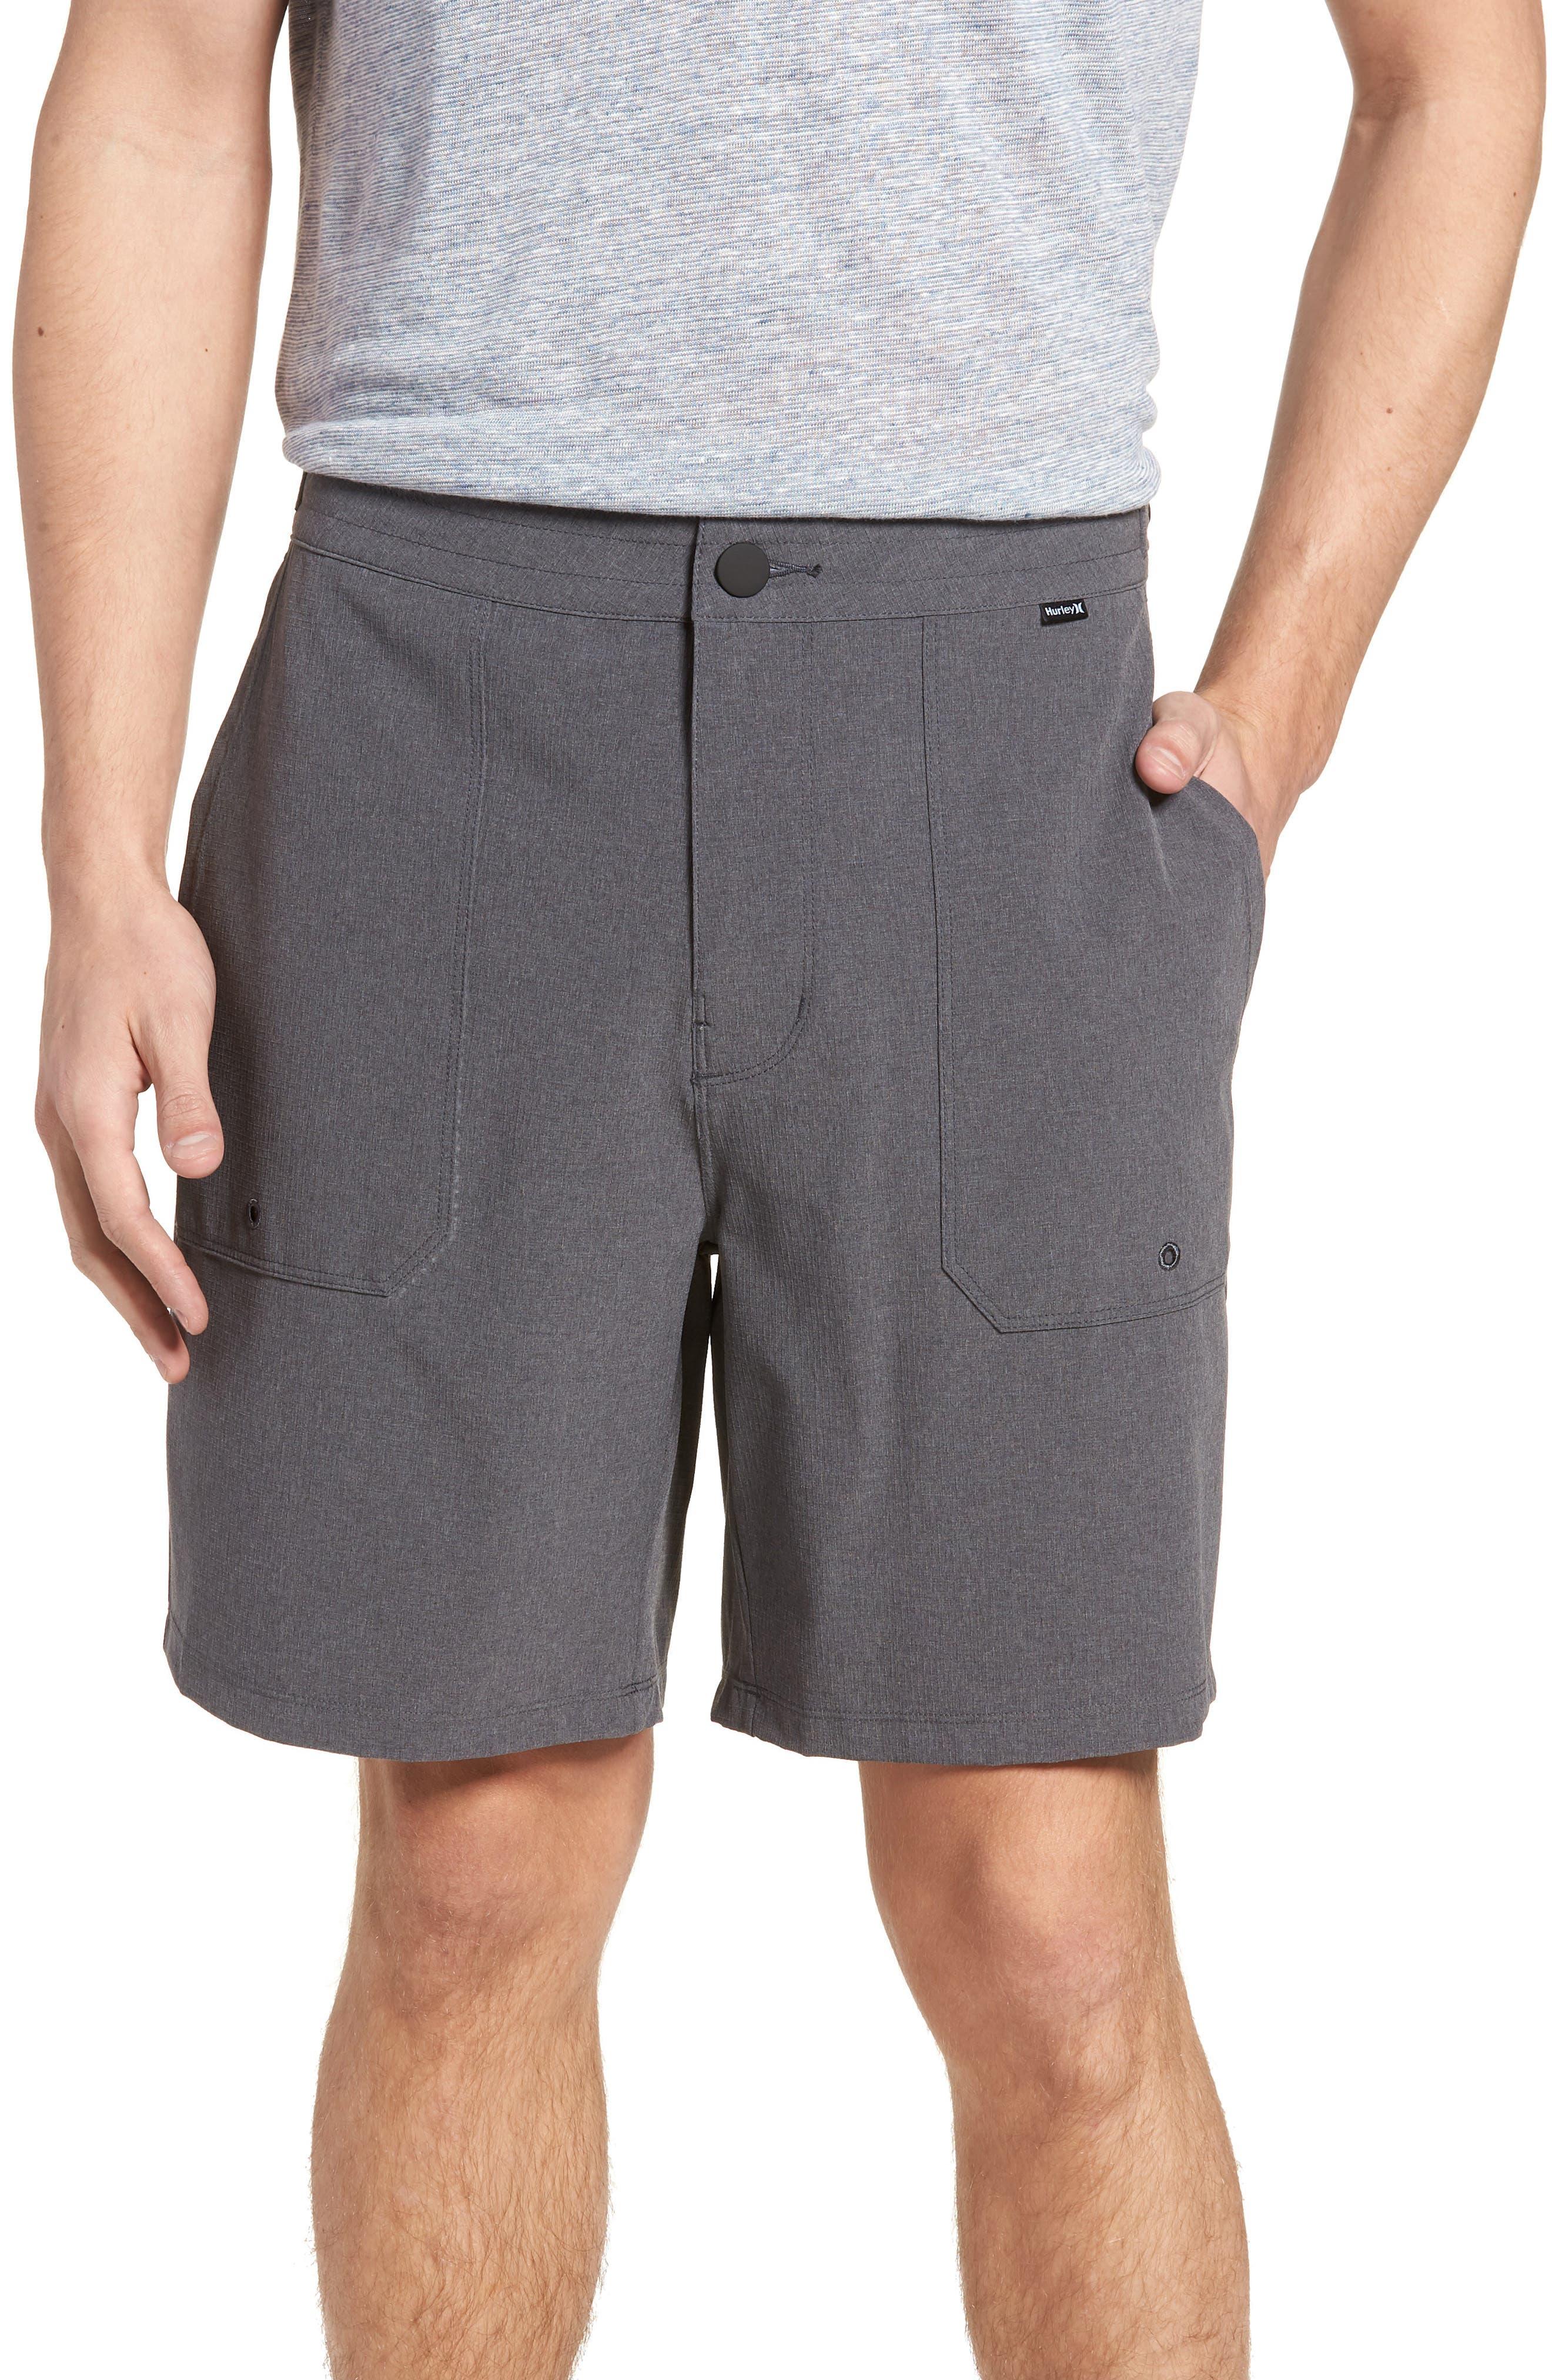 Phantom Coastline Shorts,                         Main,                         color, Black Heather